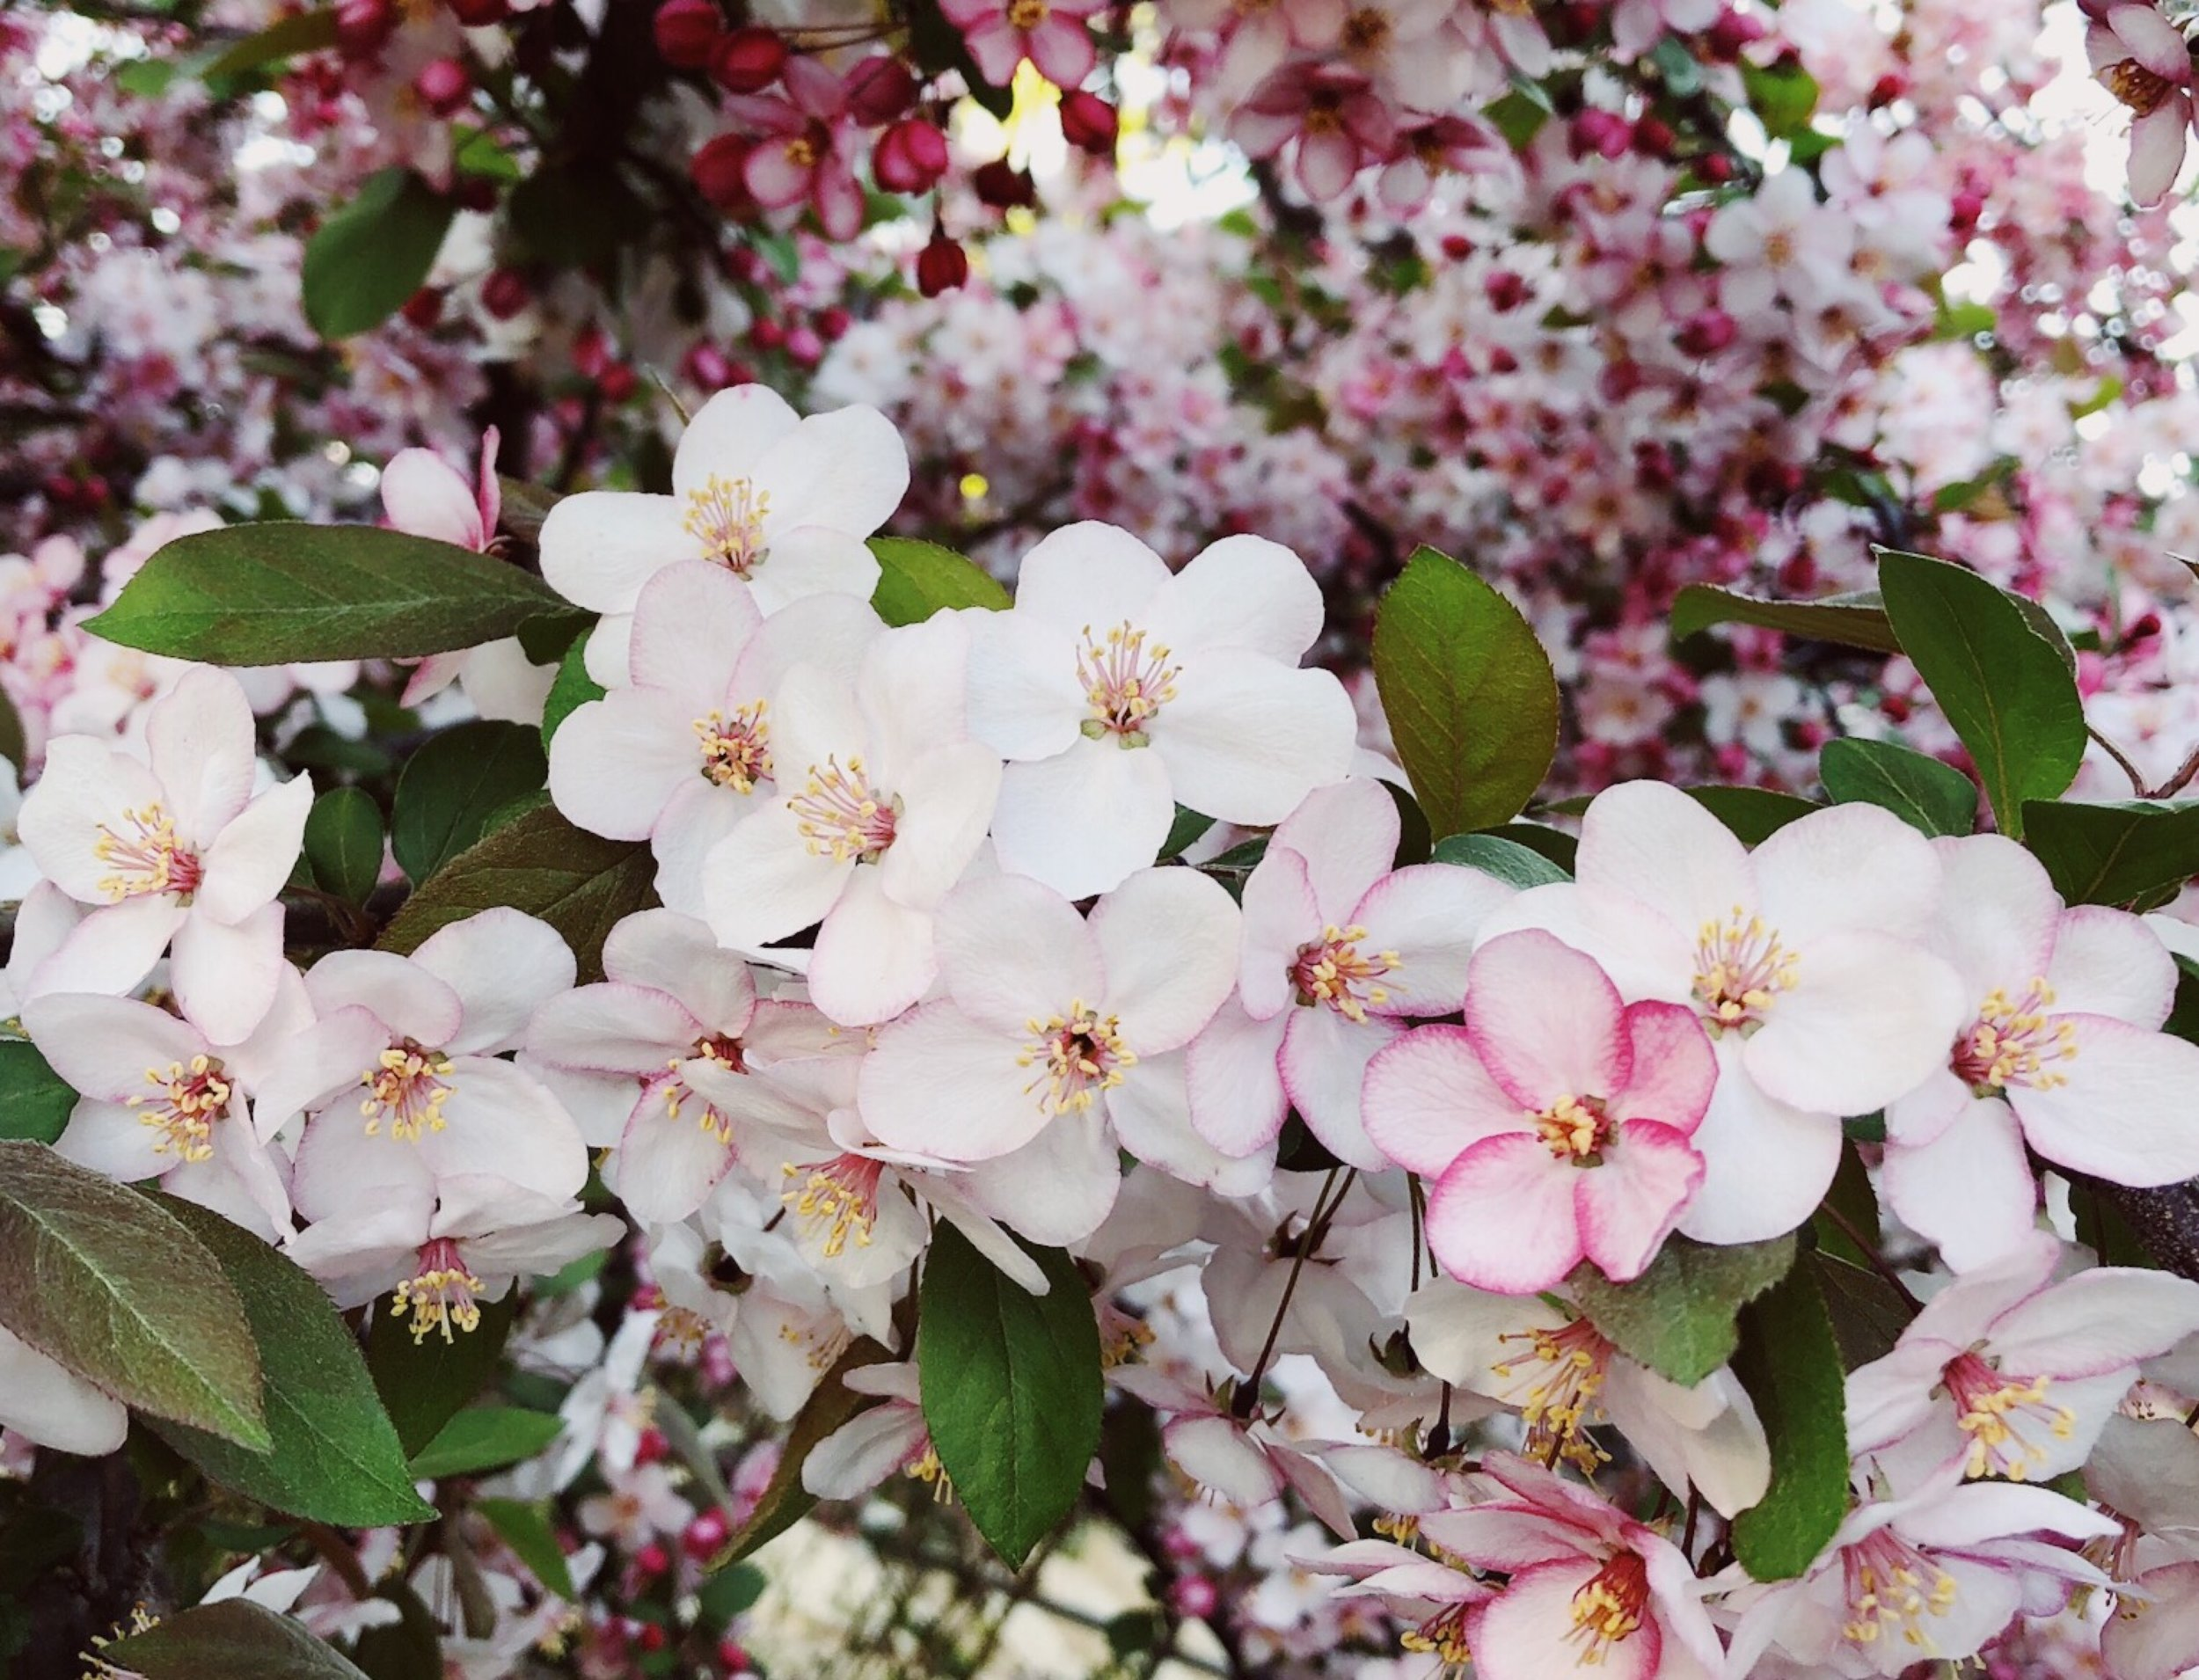 crabaple-spring-3404951.jpg